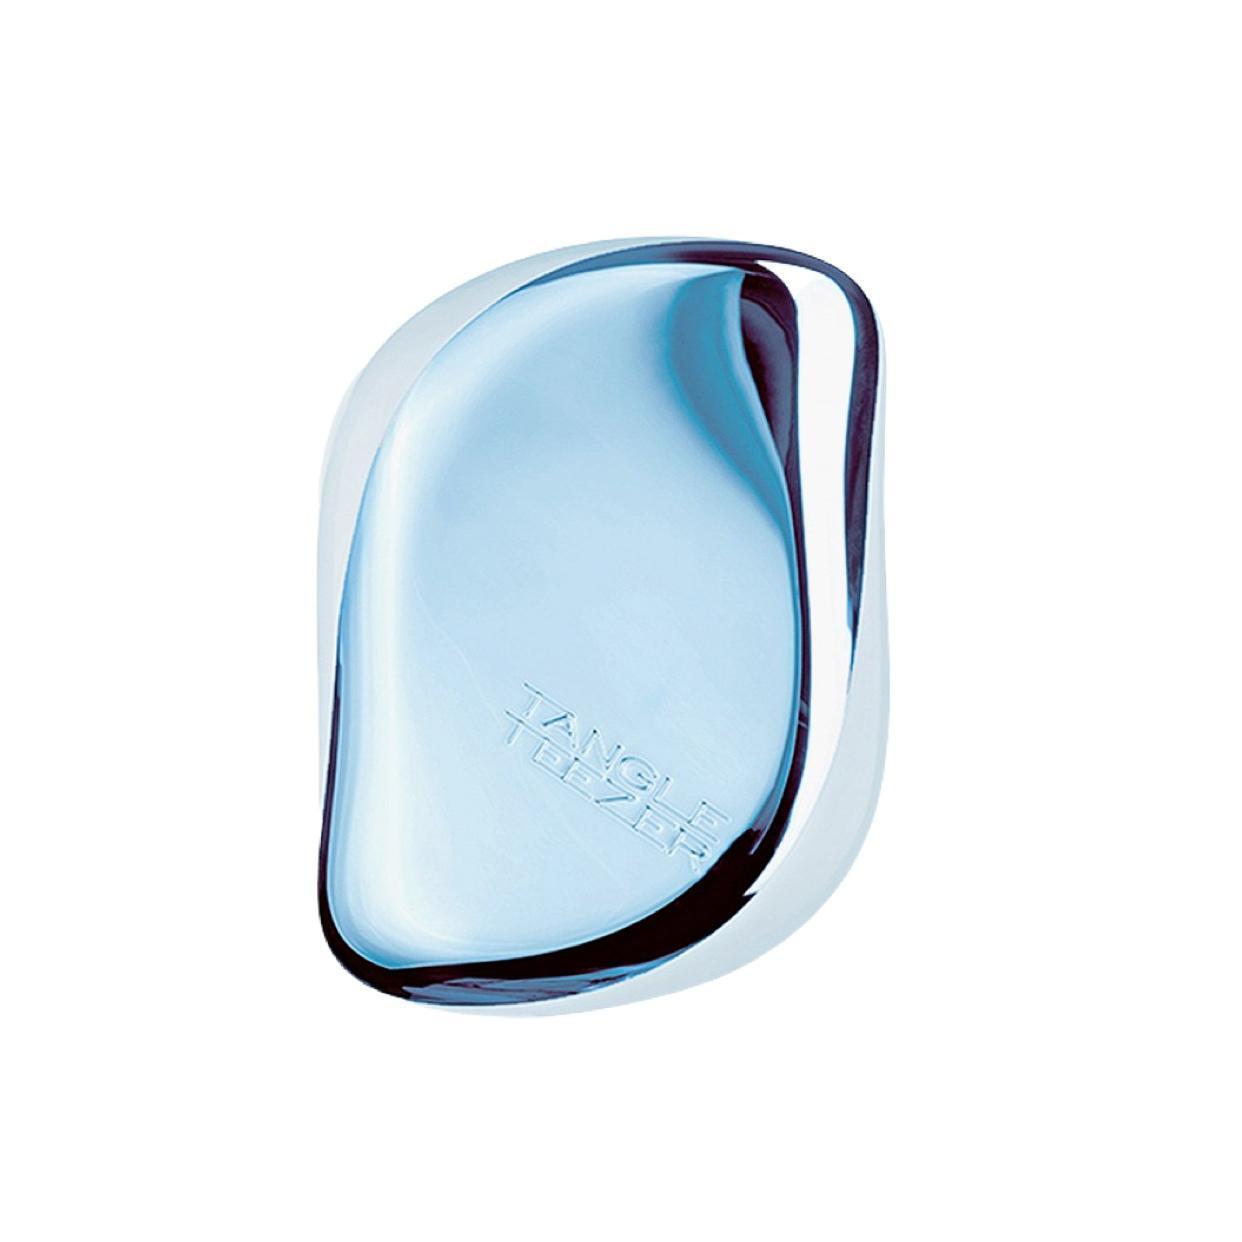 Tangle Teezer Compact Sky Blue Delight Chrome